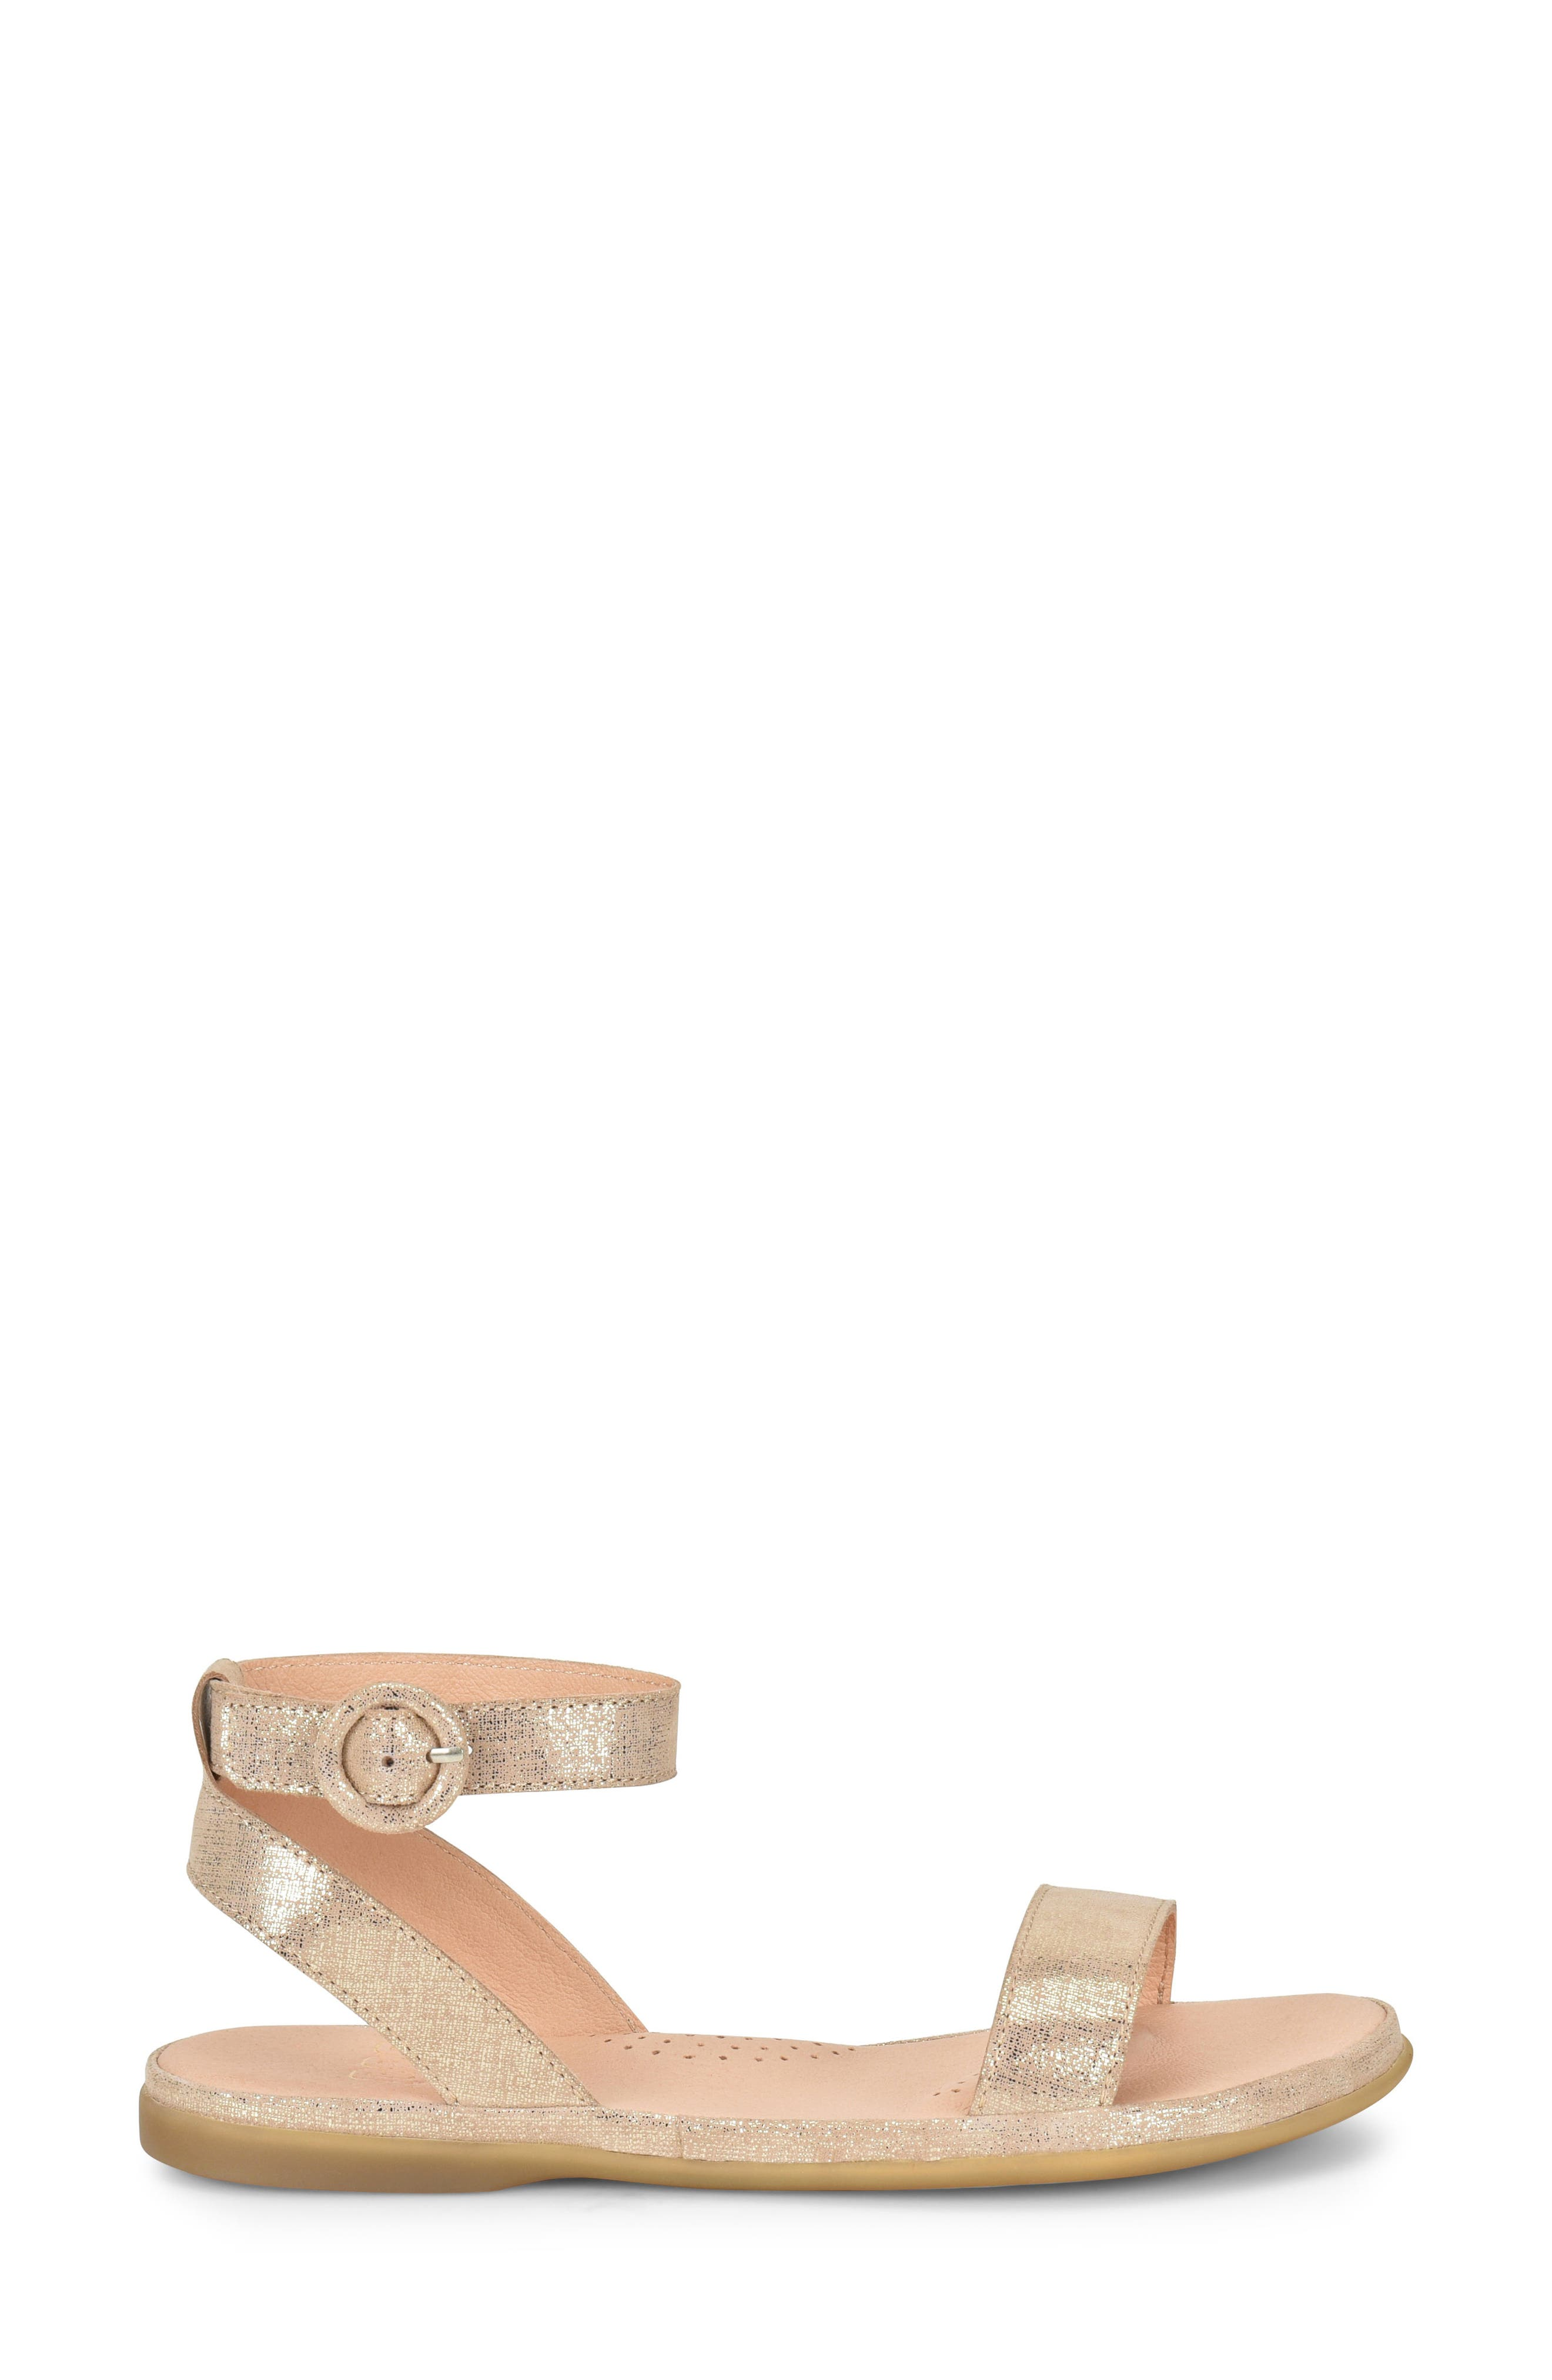 Stellan Sandal,                             Alternate thumbnail 3, color,                             Gold Metallic Fabric